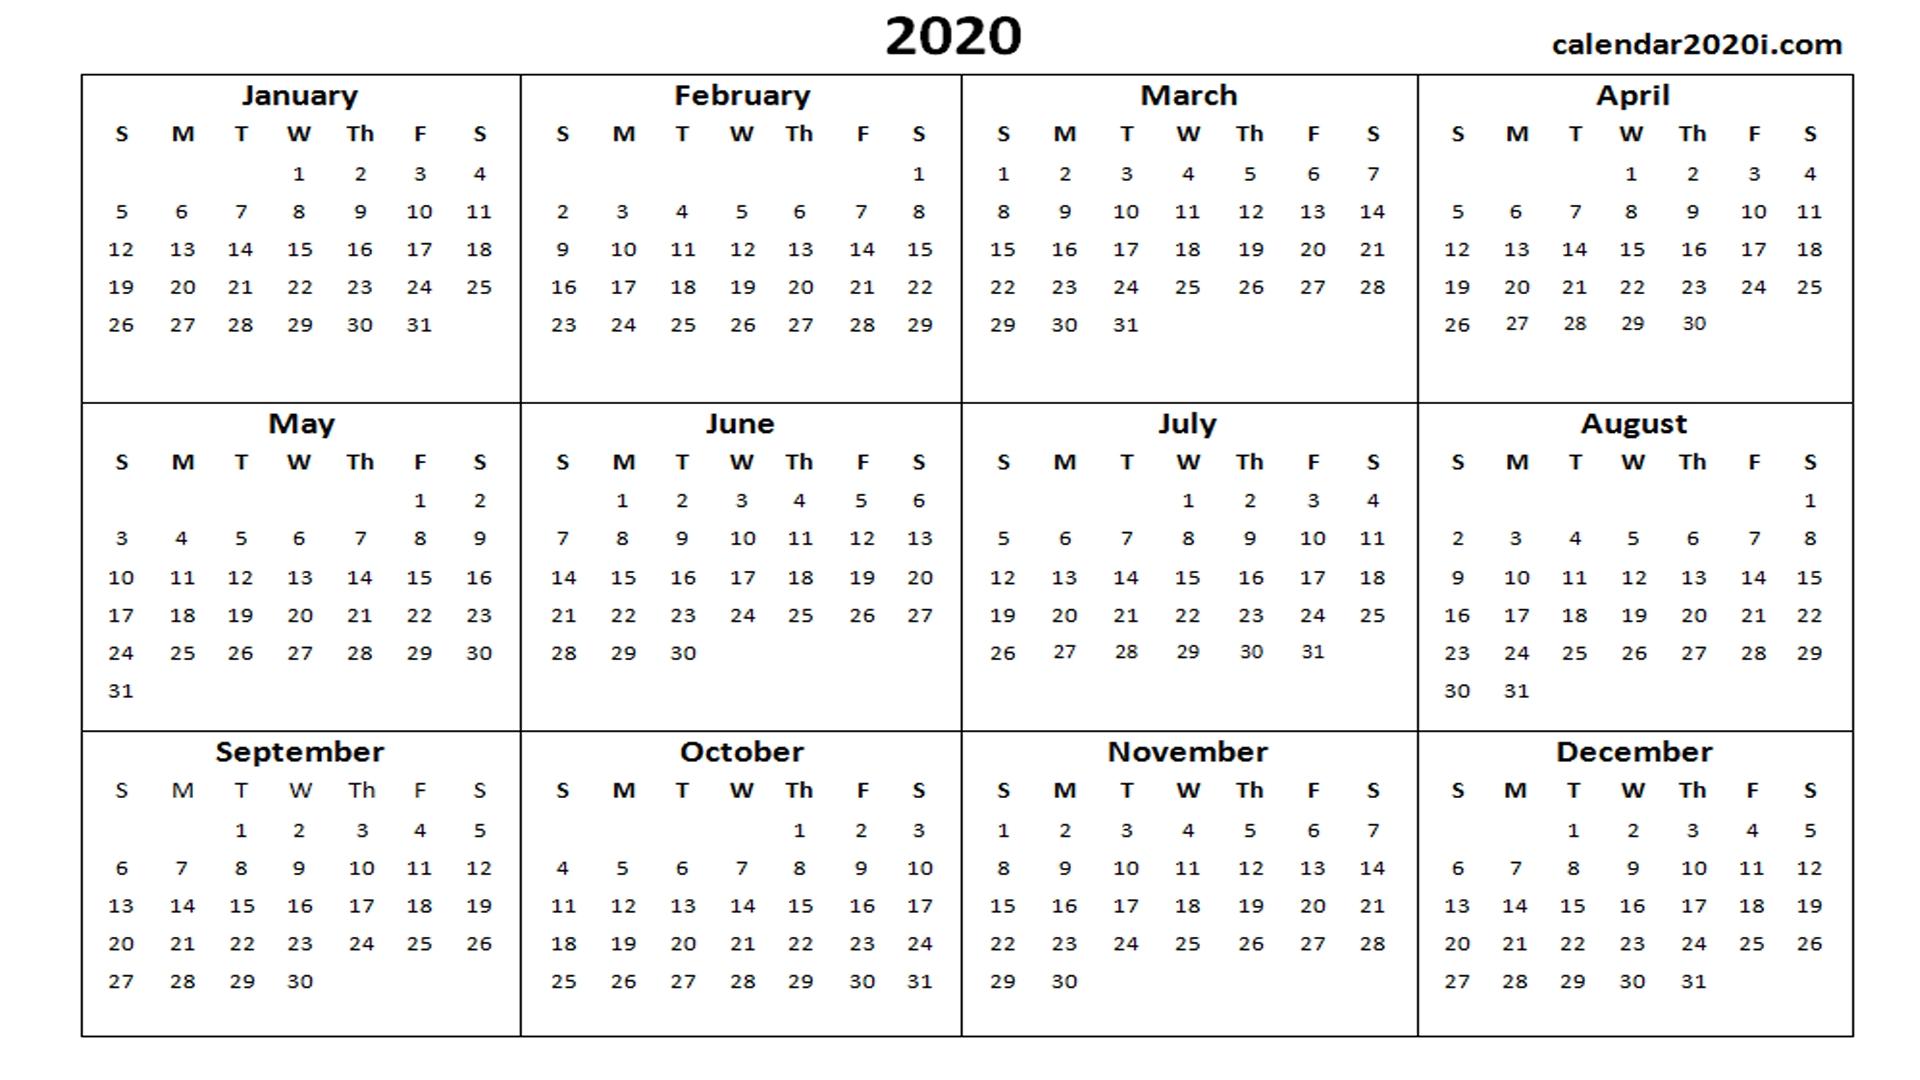 2020 Calendar Printable Template Holidays, Word, Excel, Pdf-Microsoft Word 2020 Calendar Template